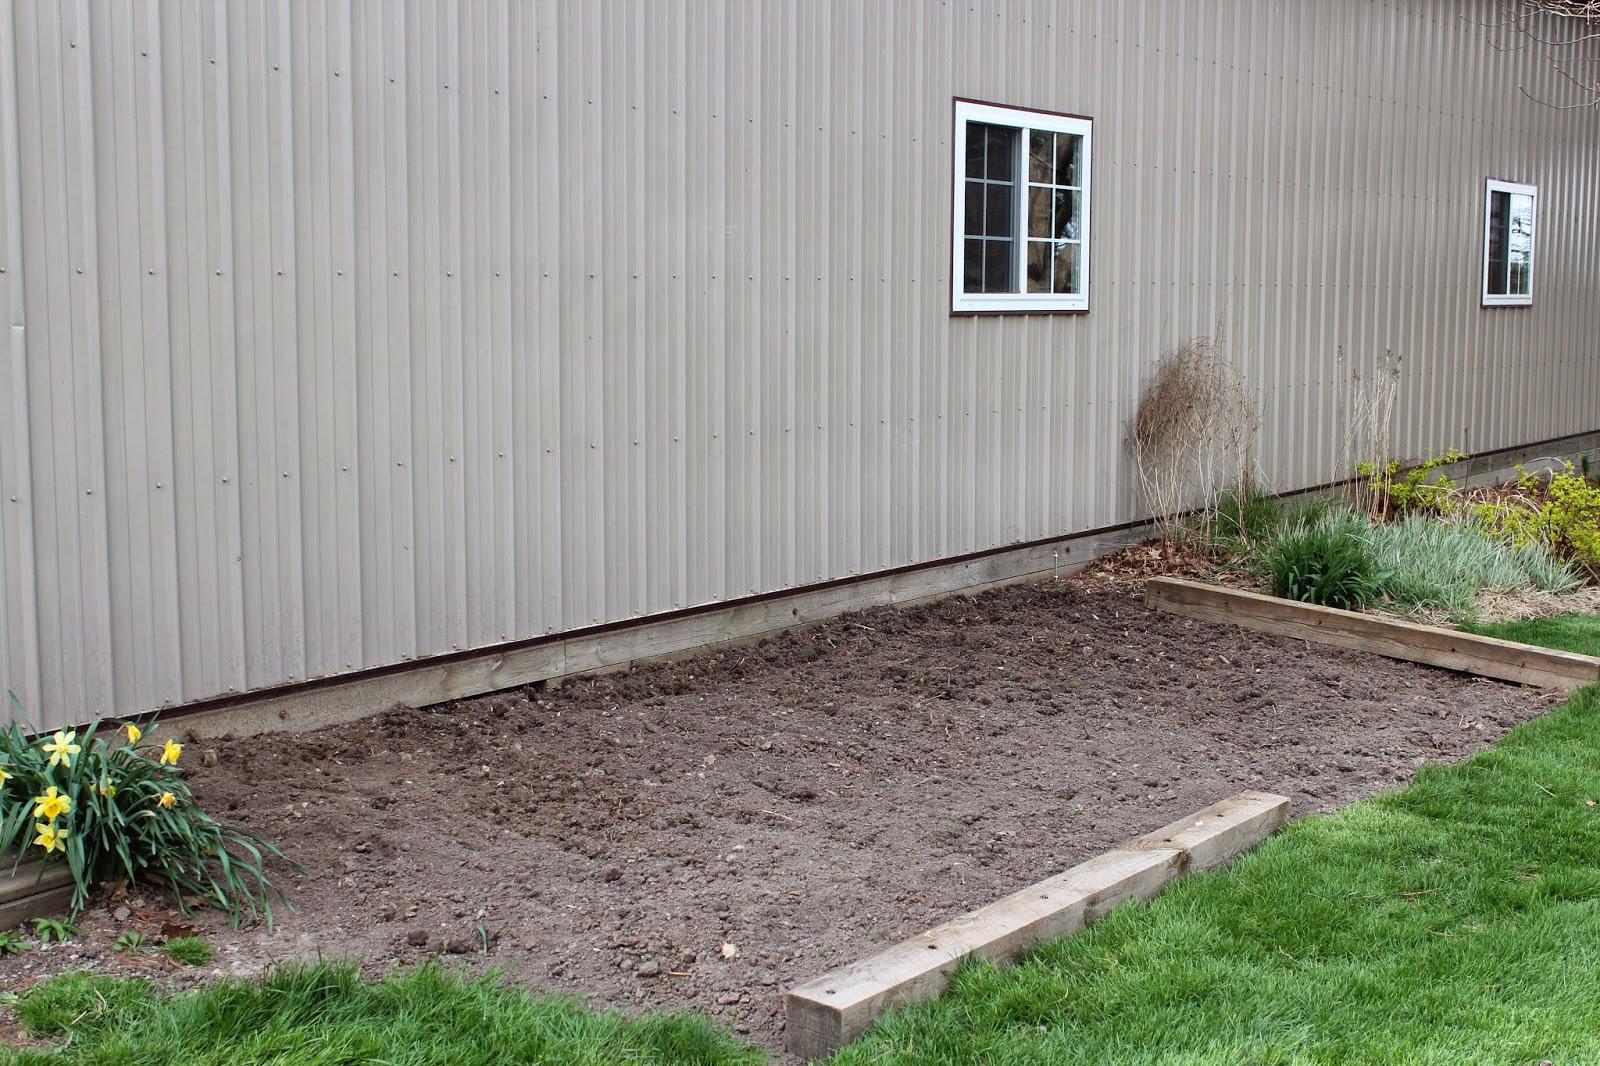 IMG 4525 - The Garden